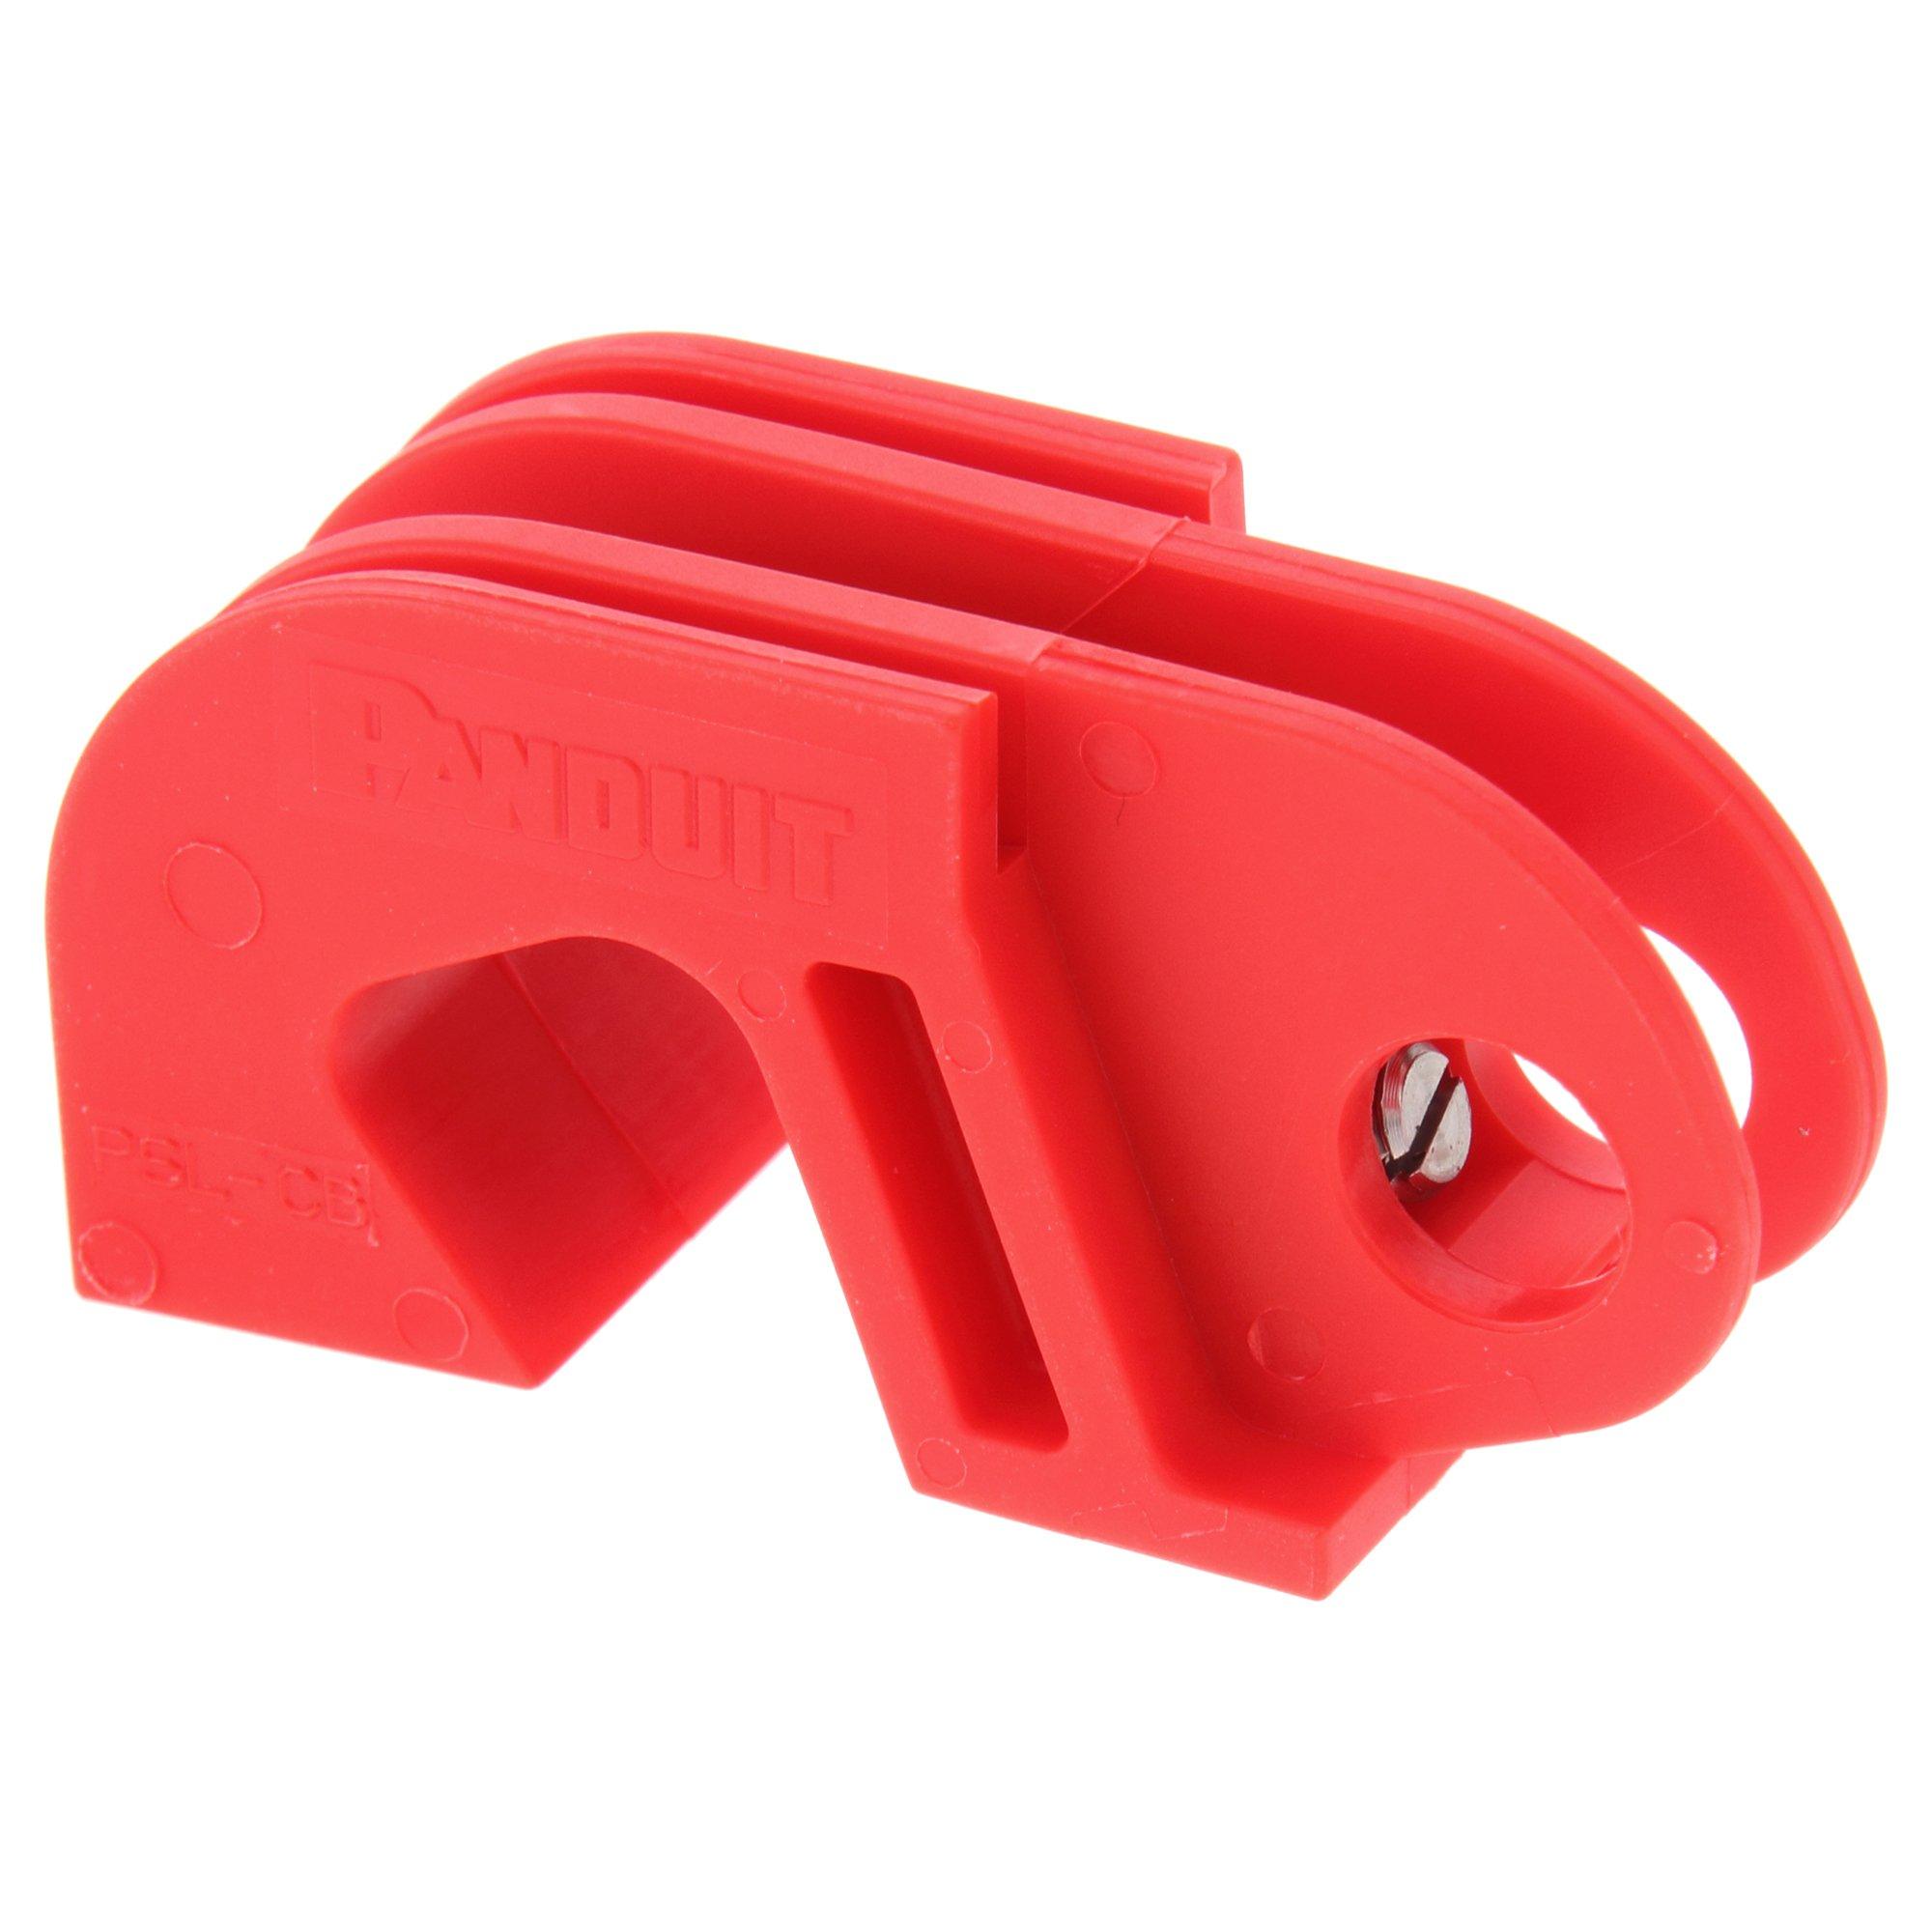 Panduit PSL-CB Universal Circuit Breaker Lockout Device, Red